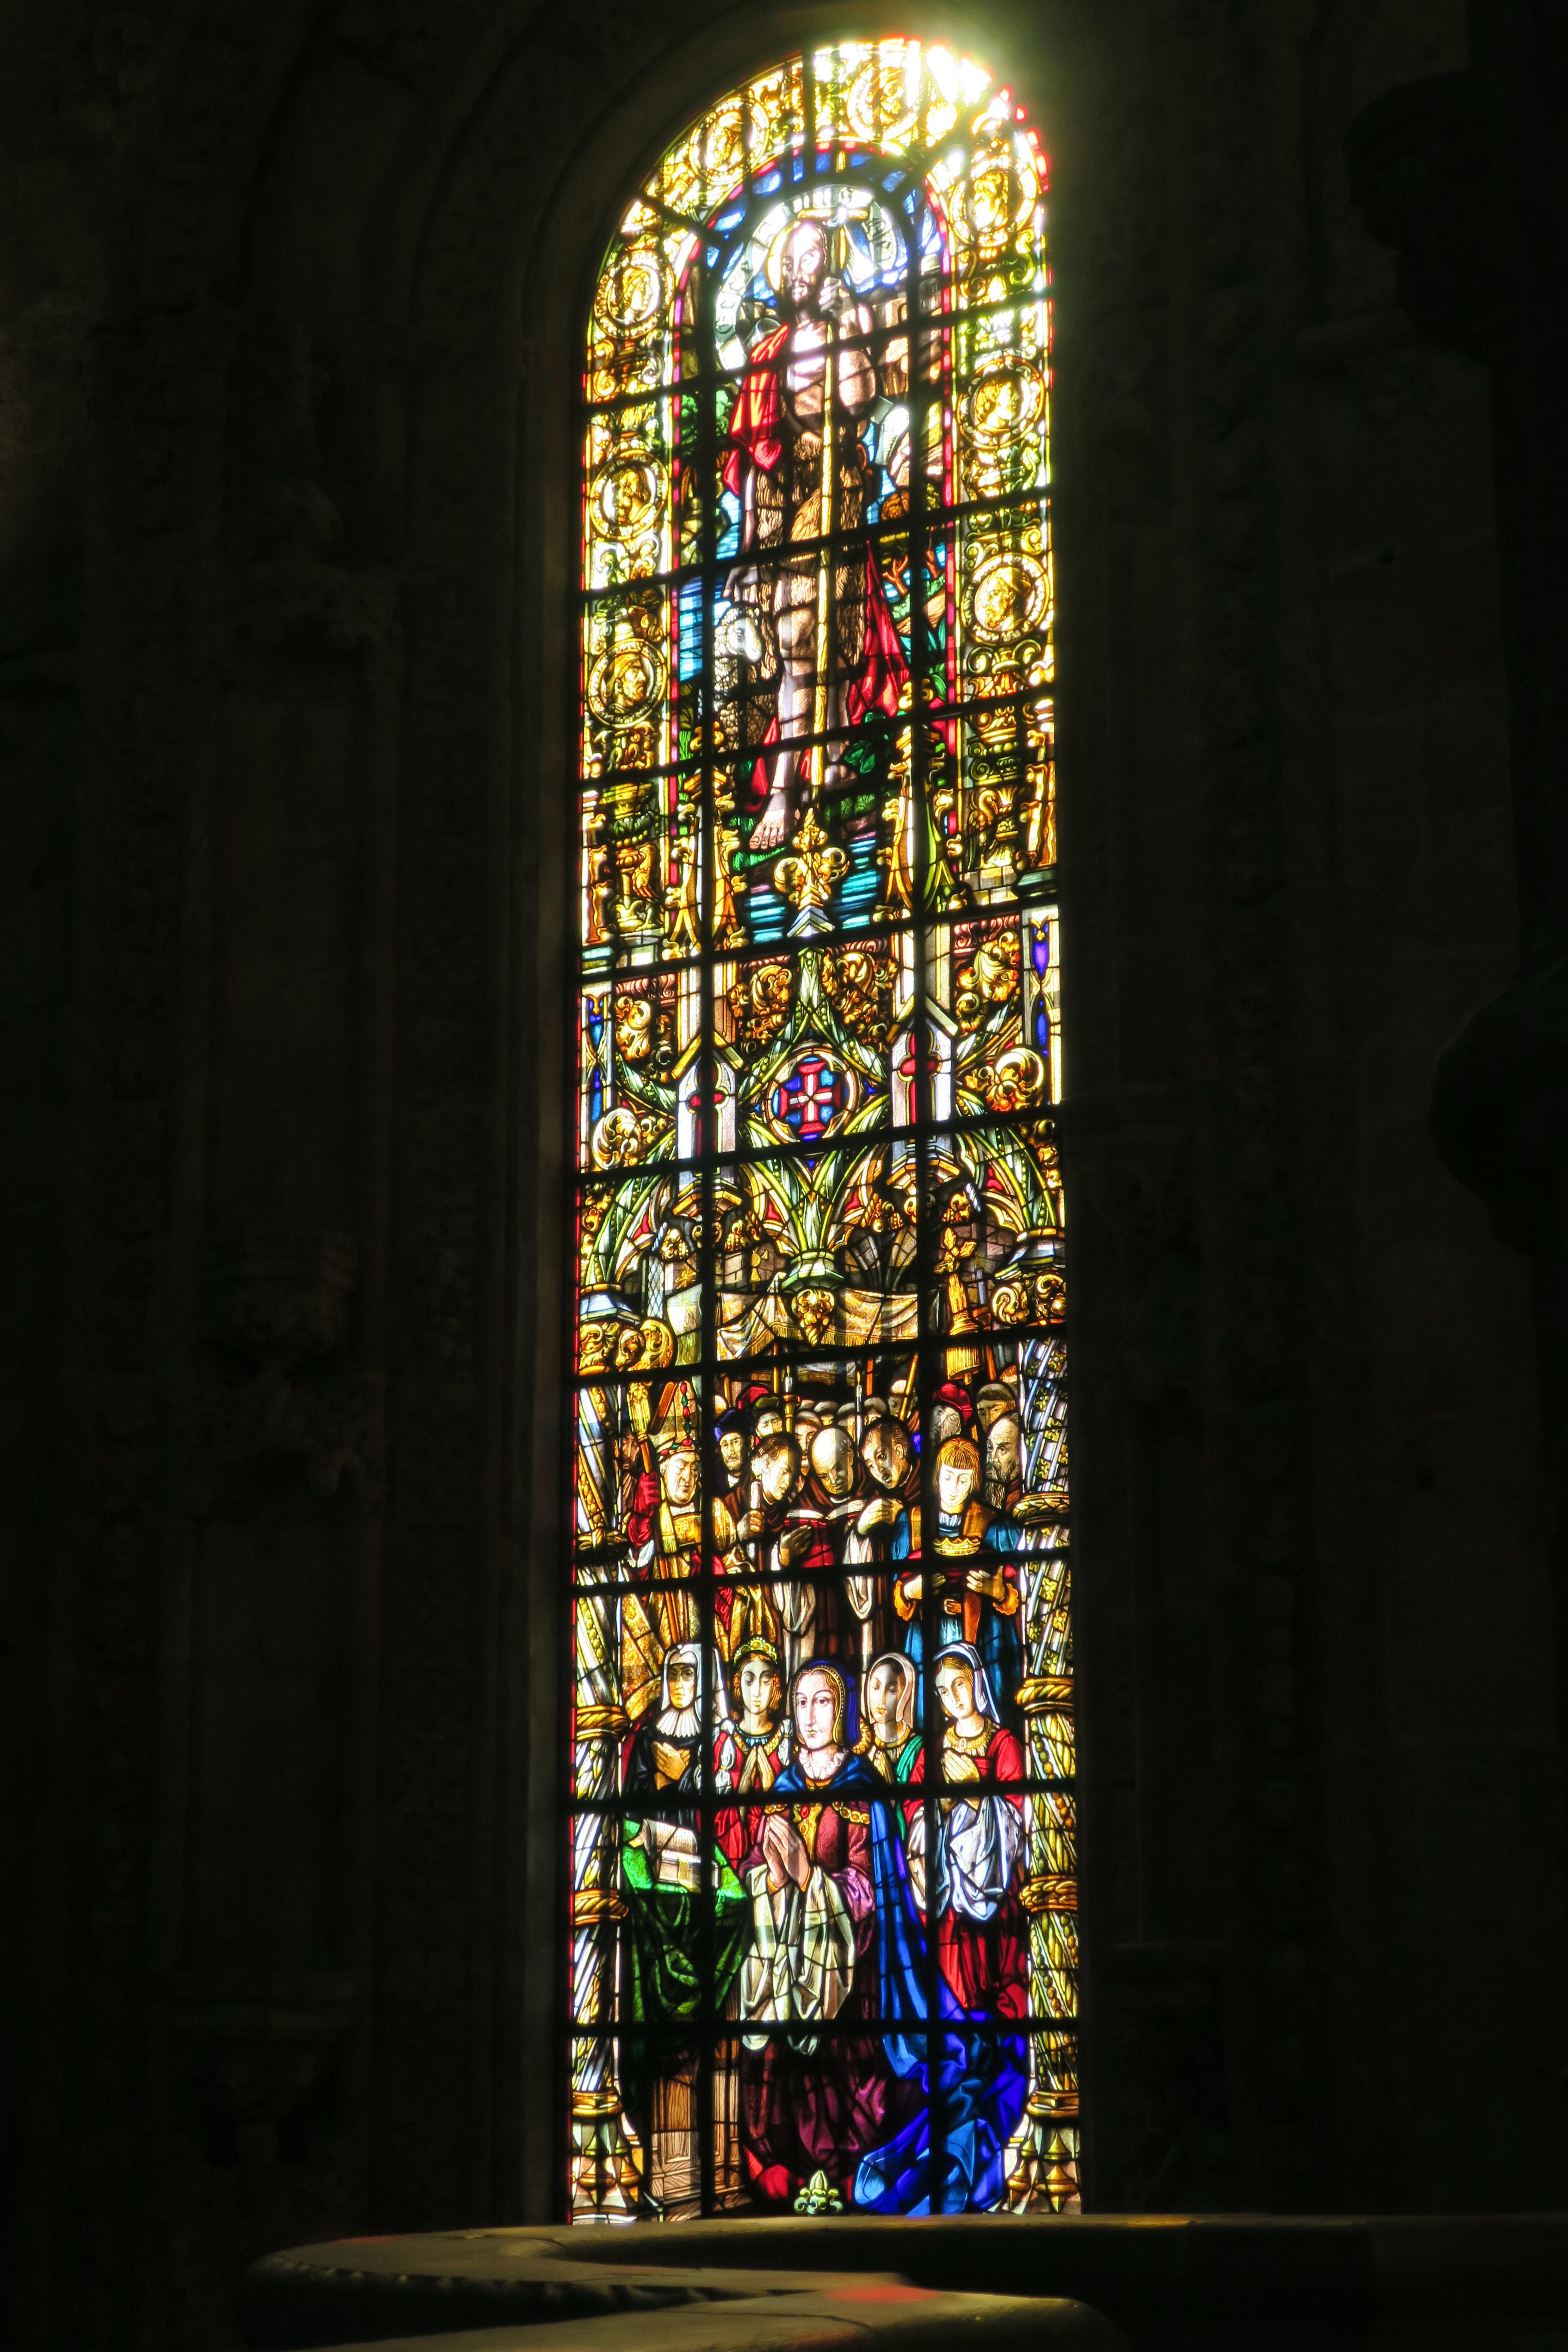 vitraux Monastère des Hiéronymites